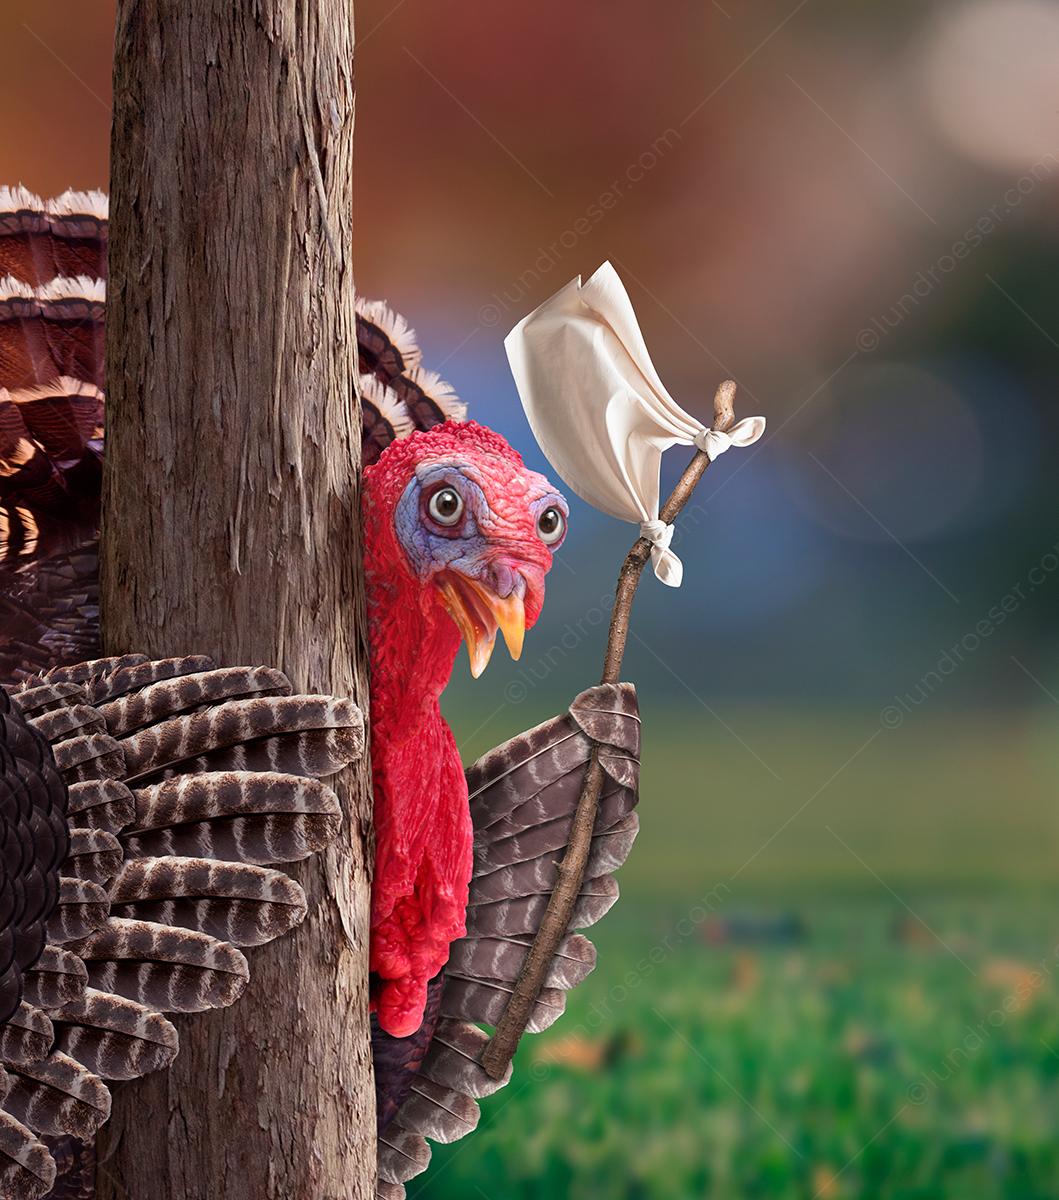 Funny_Thanksgiving_Turkey_Surrendering